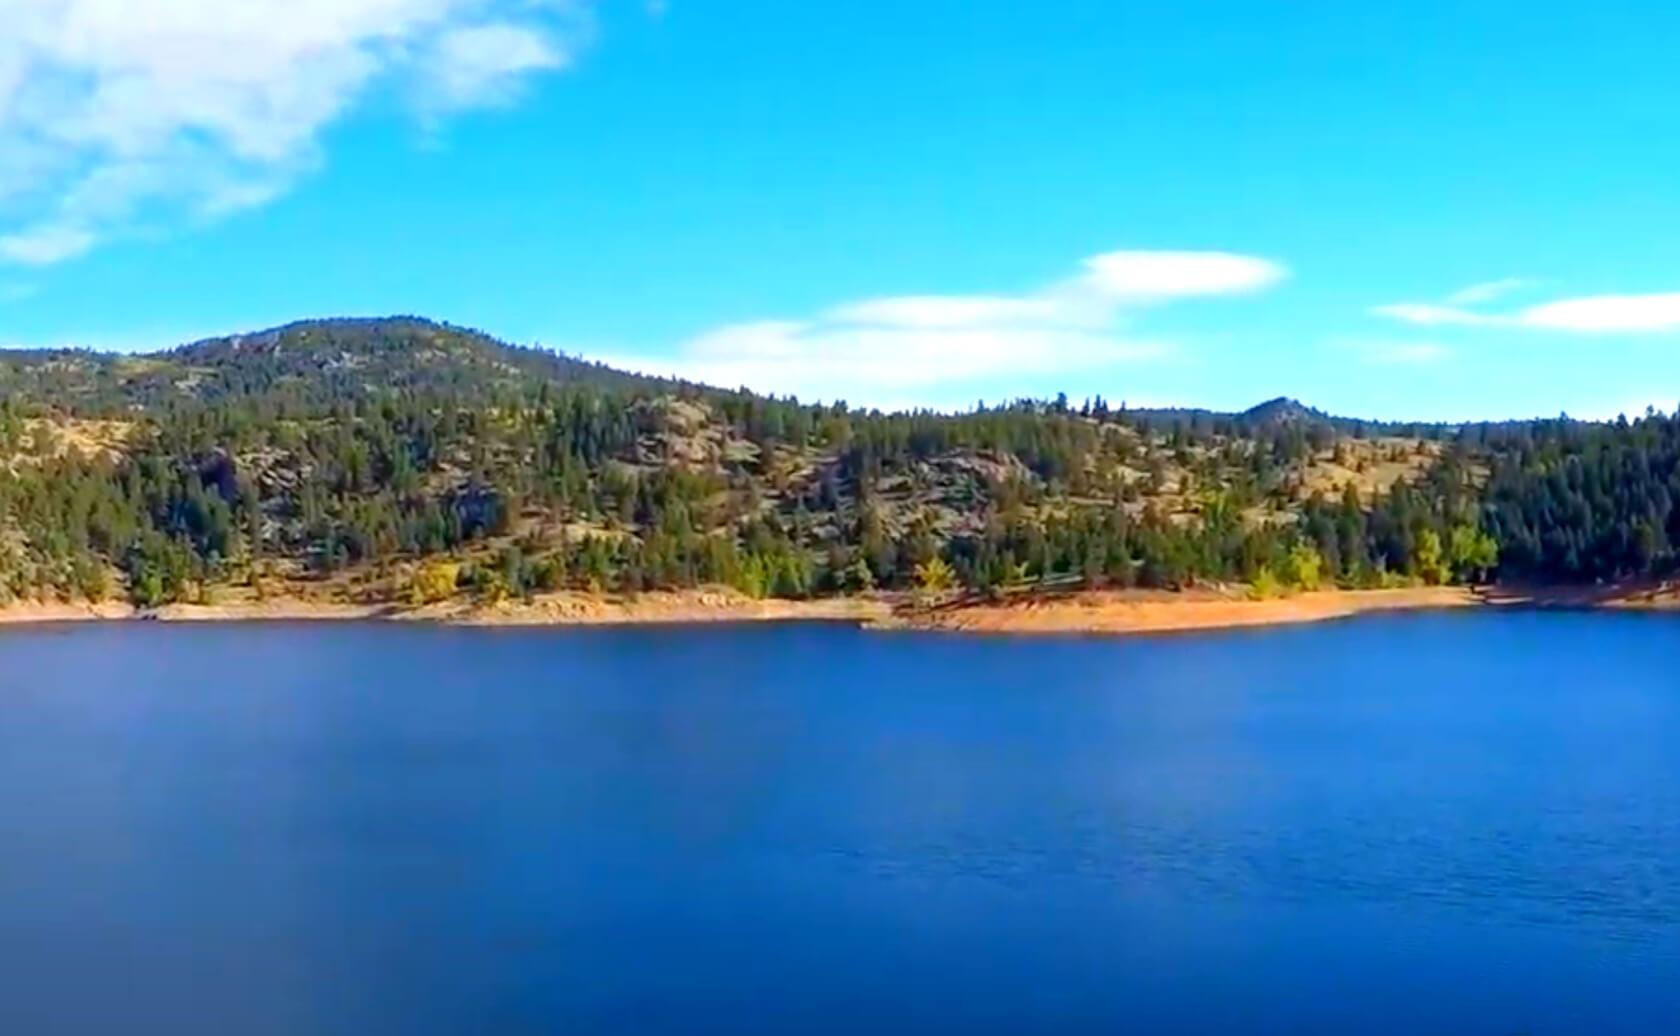 Gross-Lake-Fishing-Guide-Report-Colorado-03